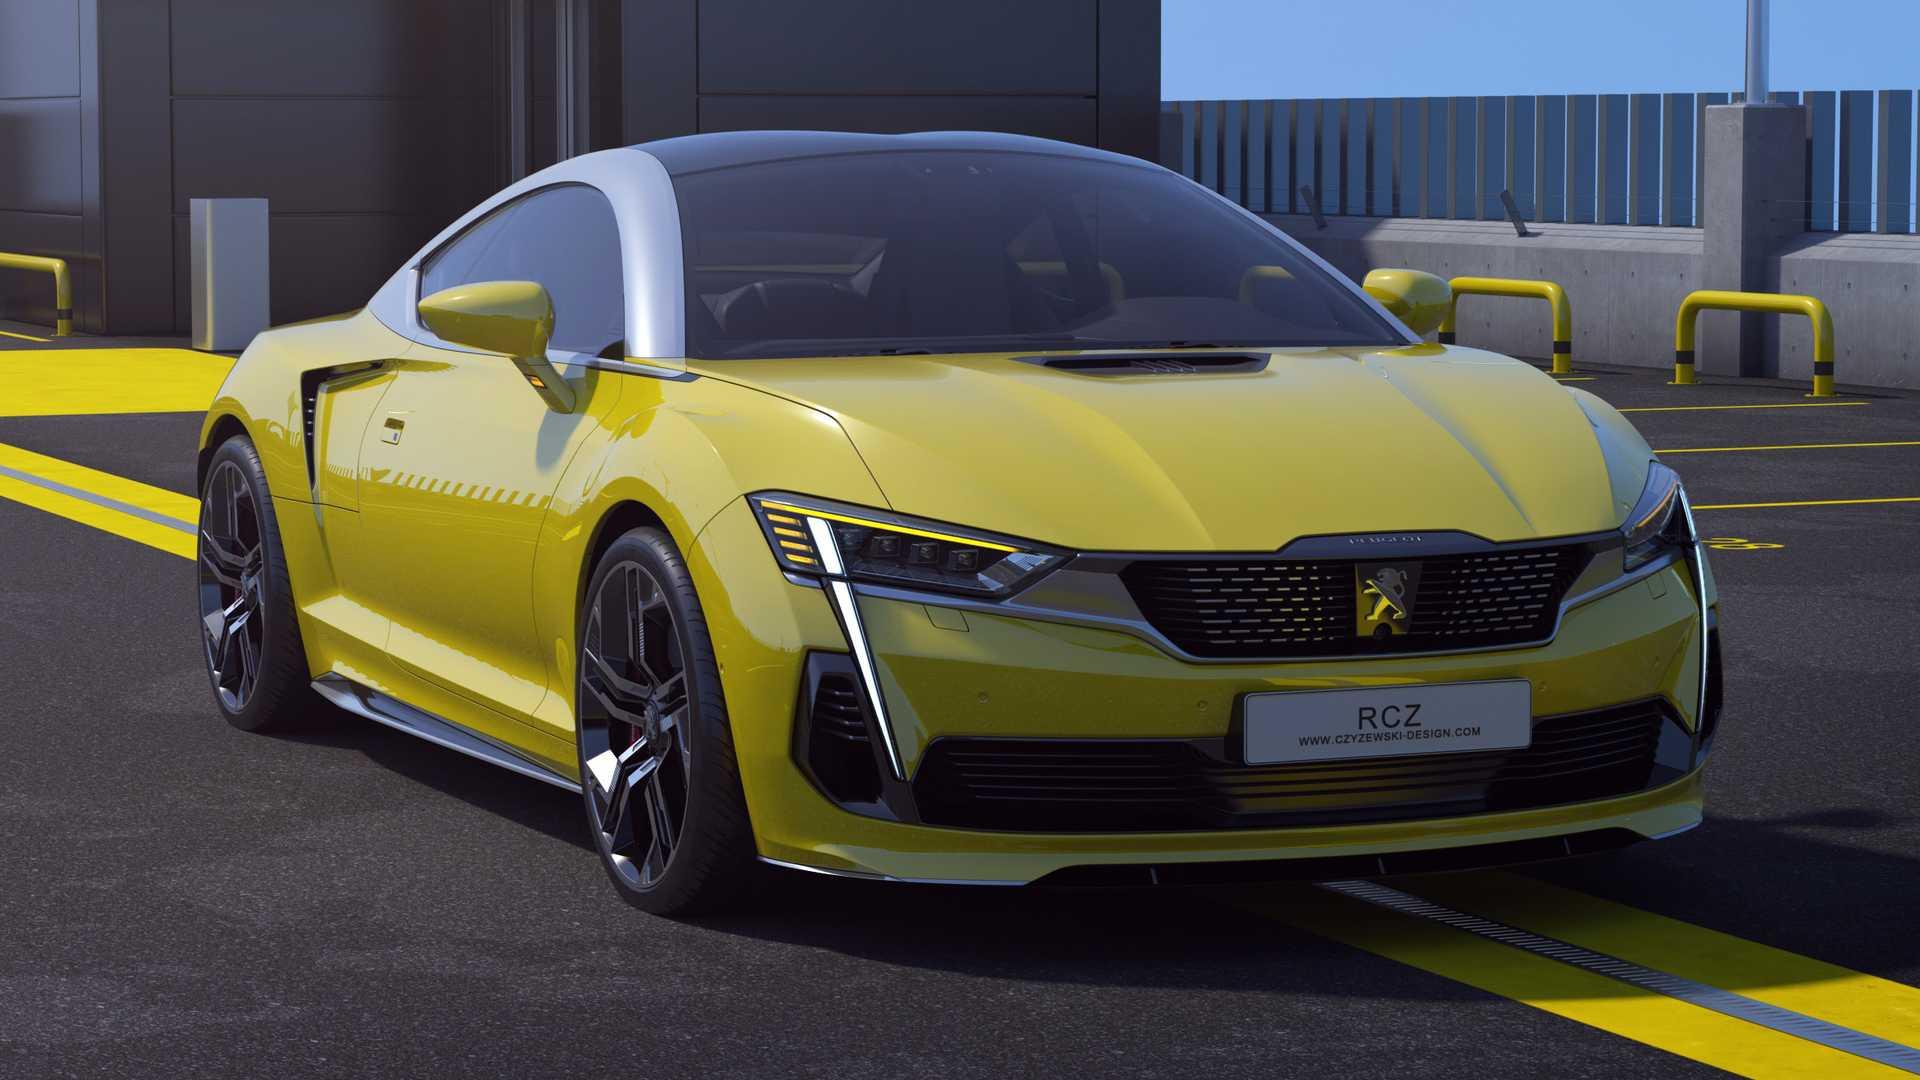 2020_Peugeot_RCZ_rendering_0014